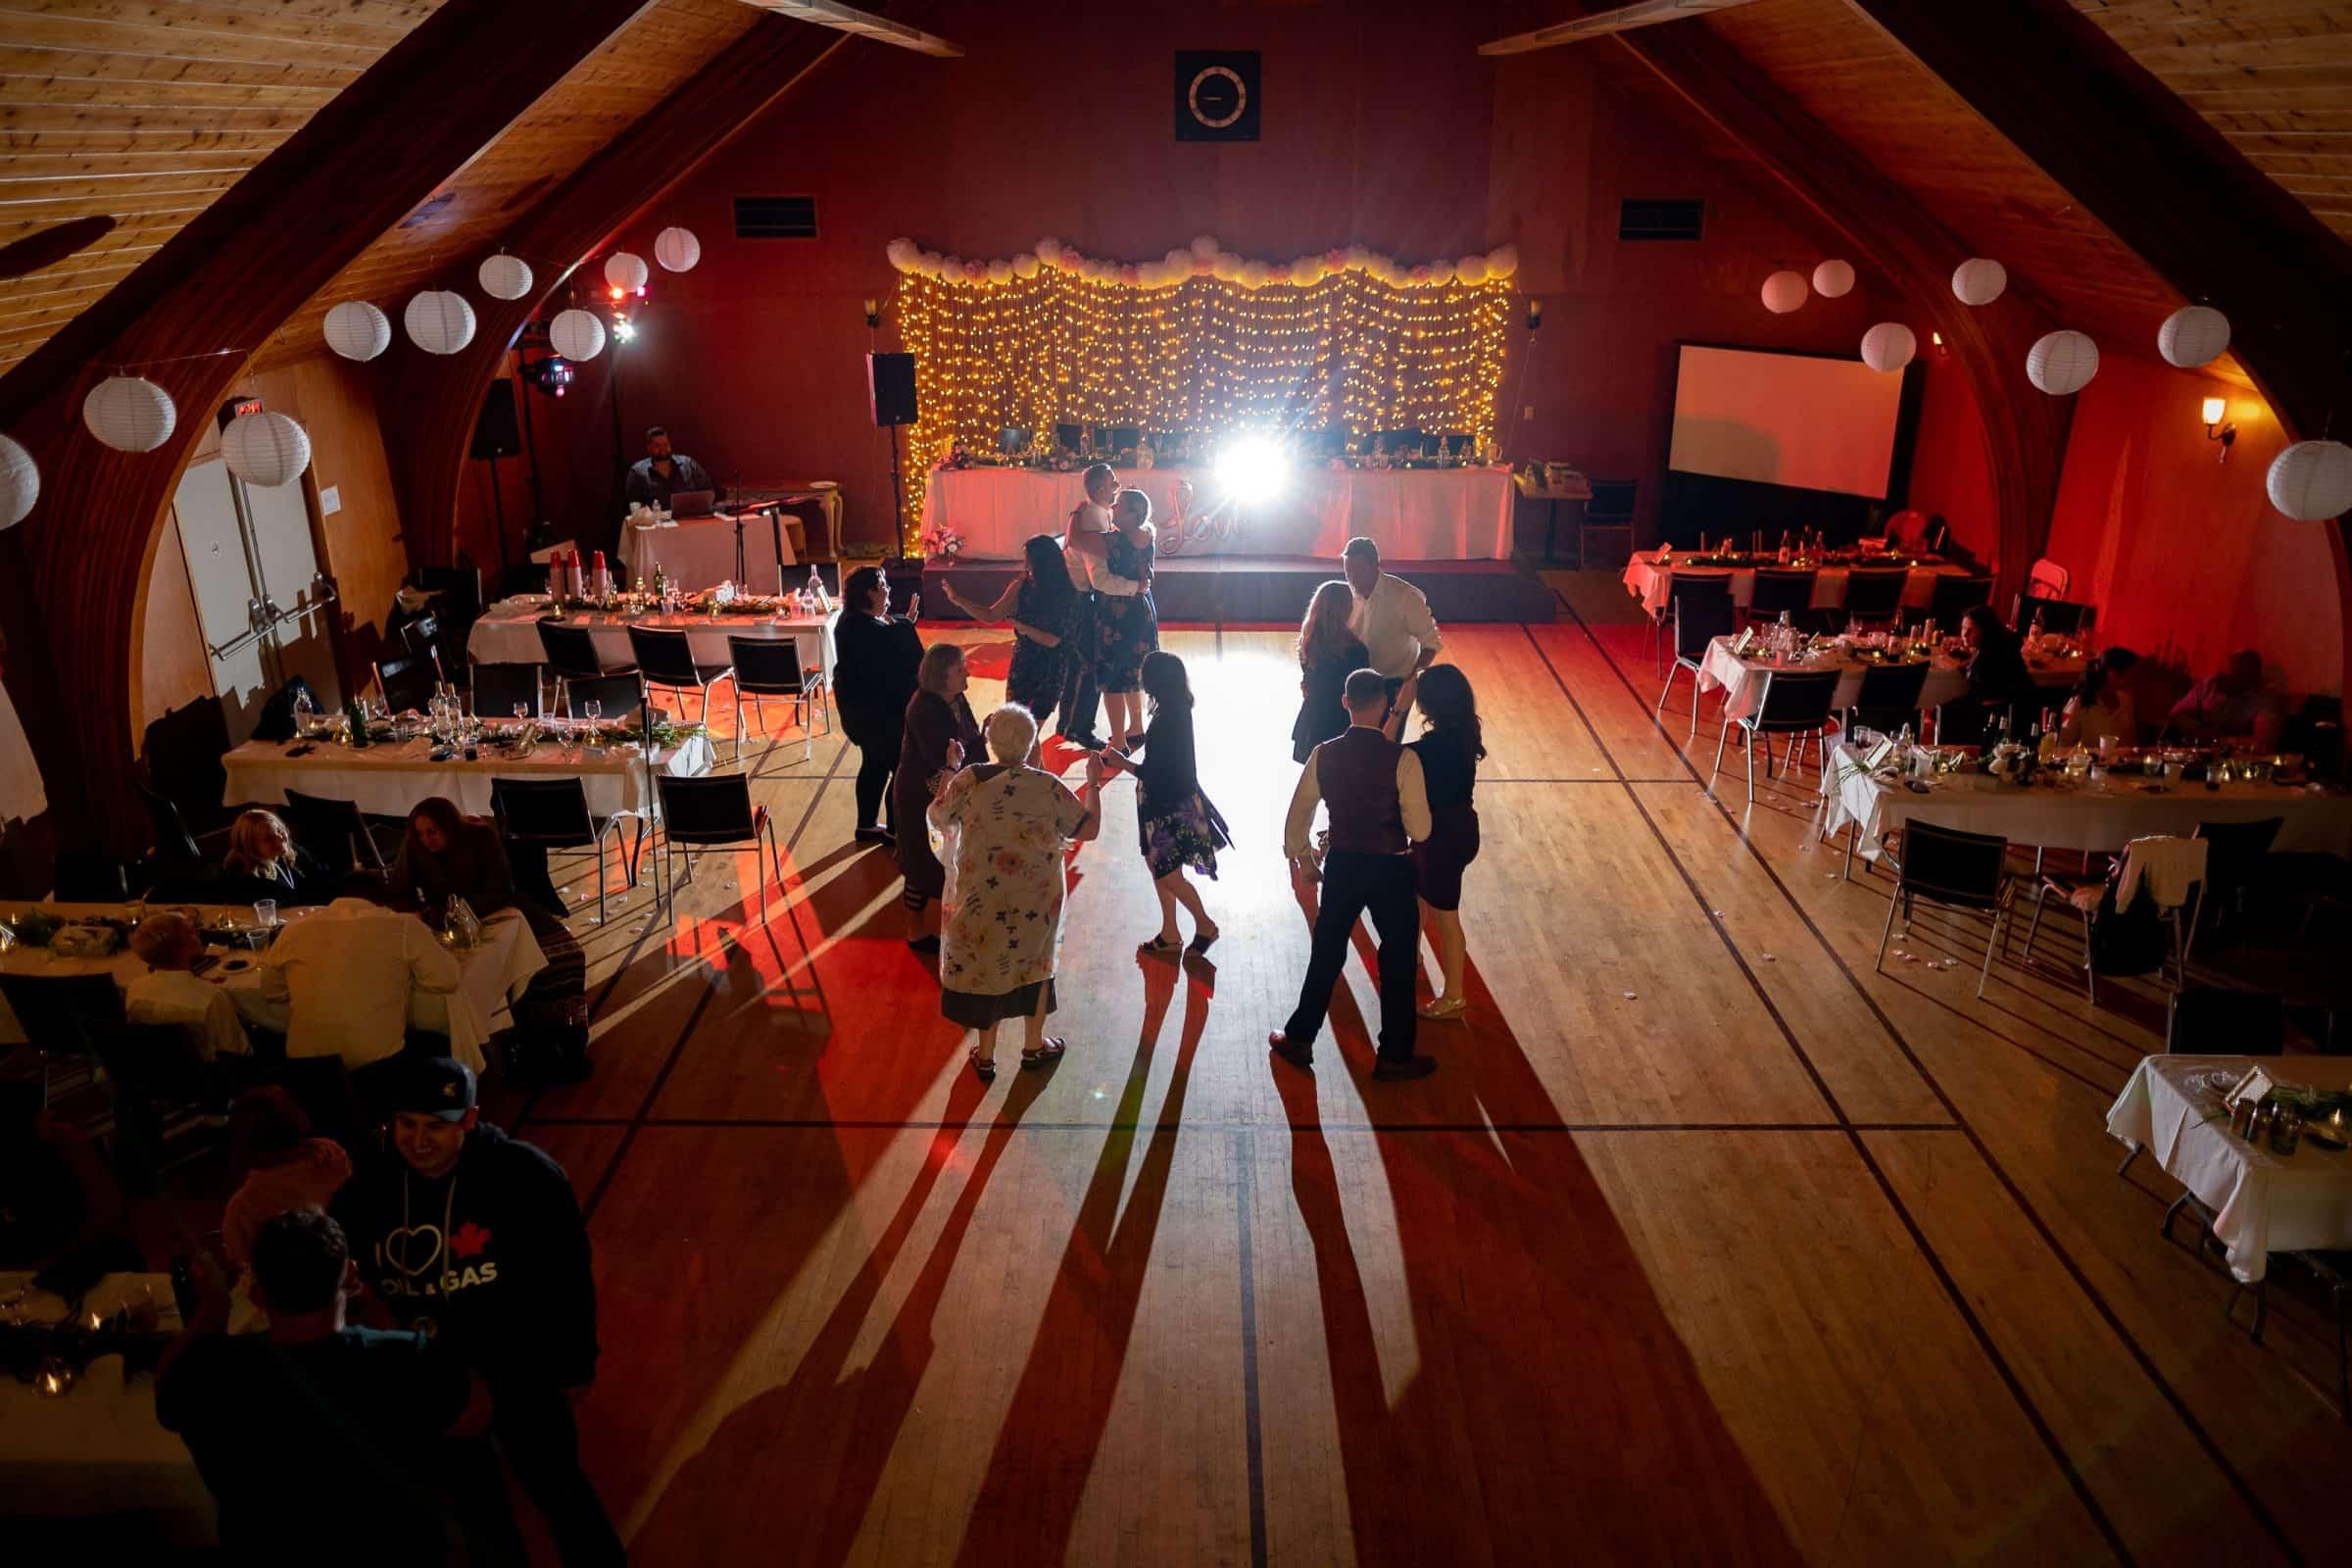 shot of a wedding dance floor from above